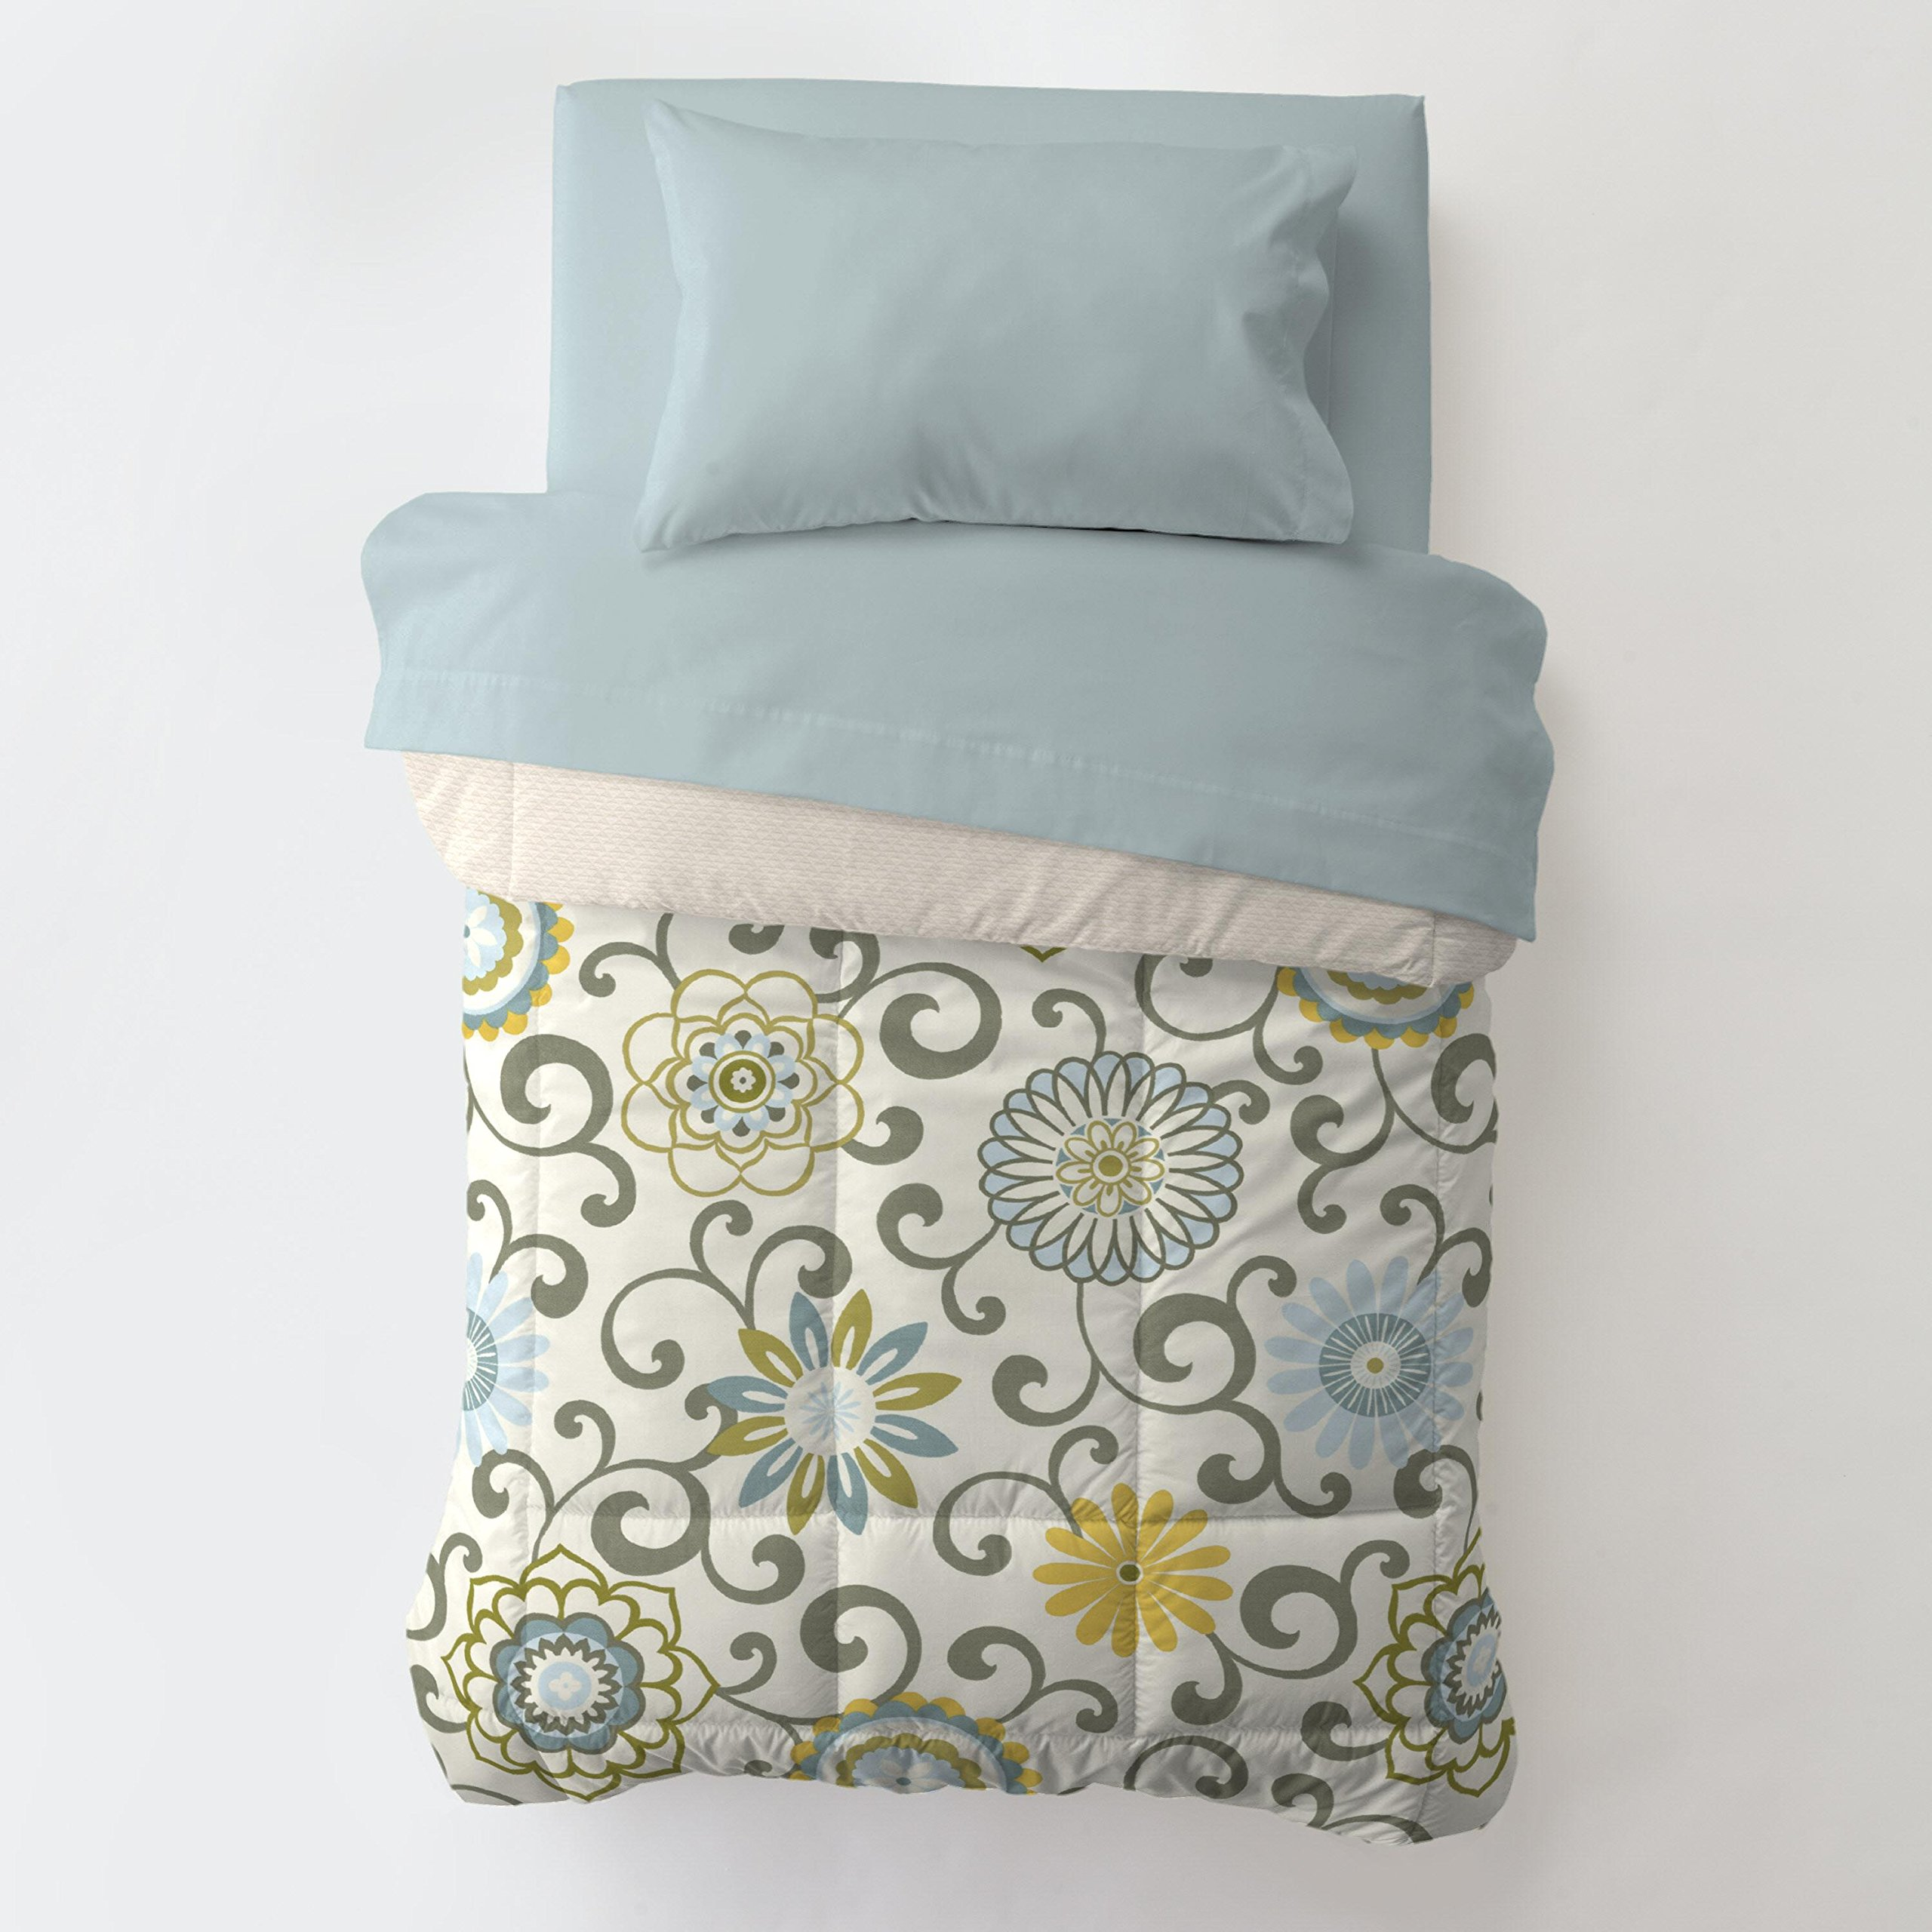 Carousel Designs Spa Pom Pon Play Toddler Bed Comforter